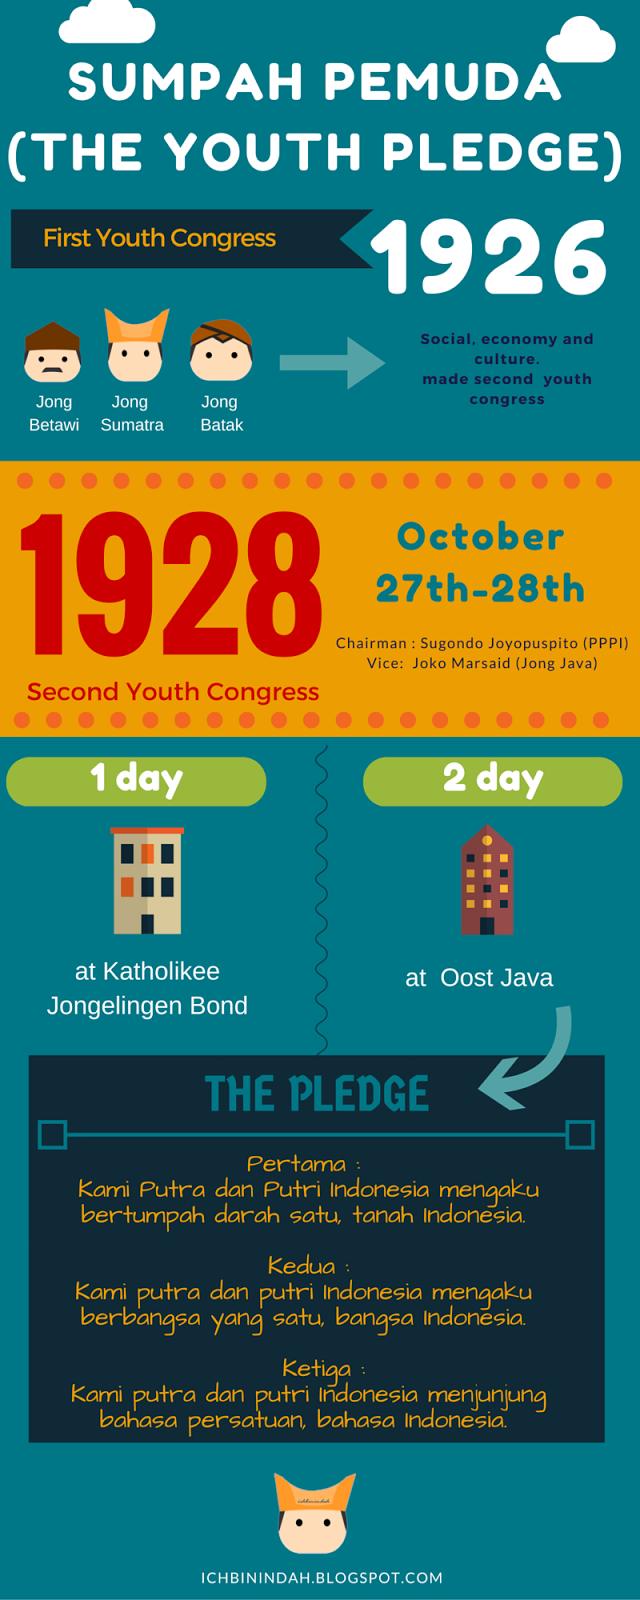 The Youth Pledge, SUMPAH PEMUDA - ichbinindah